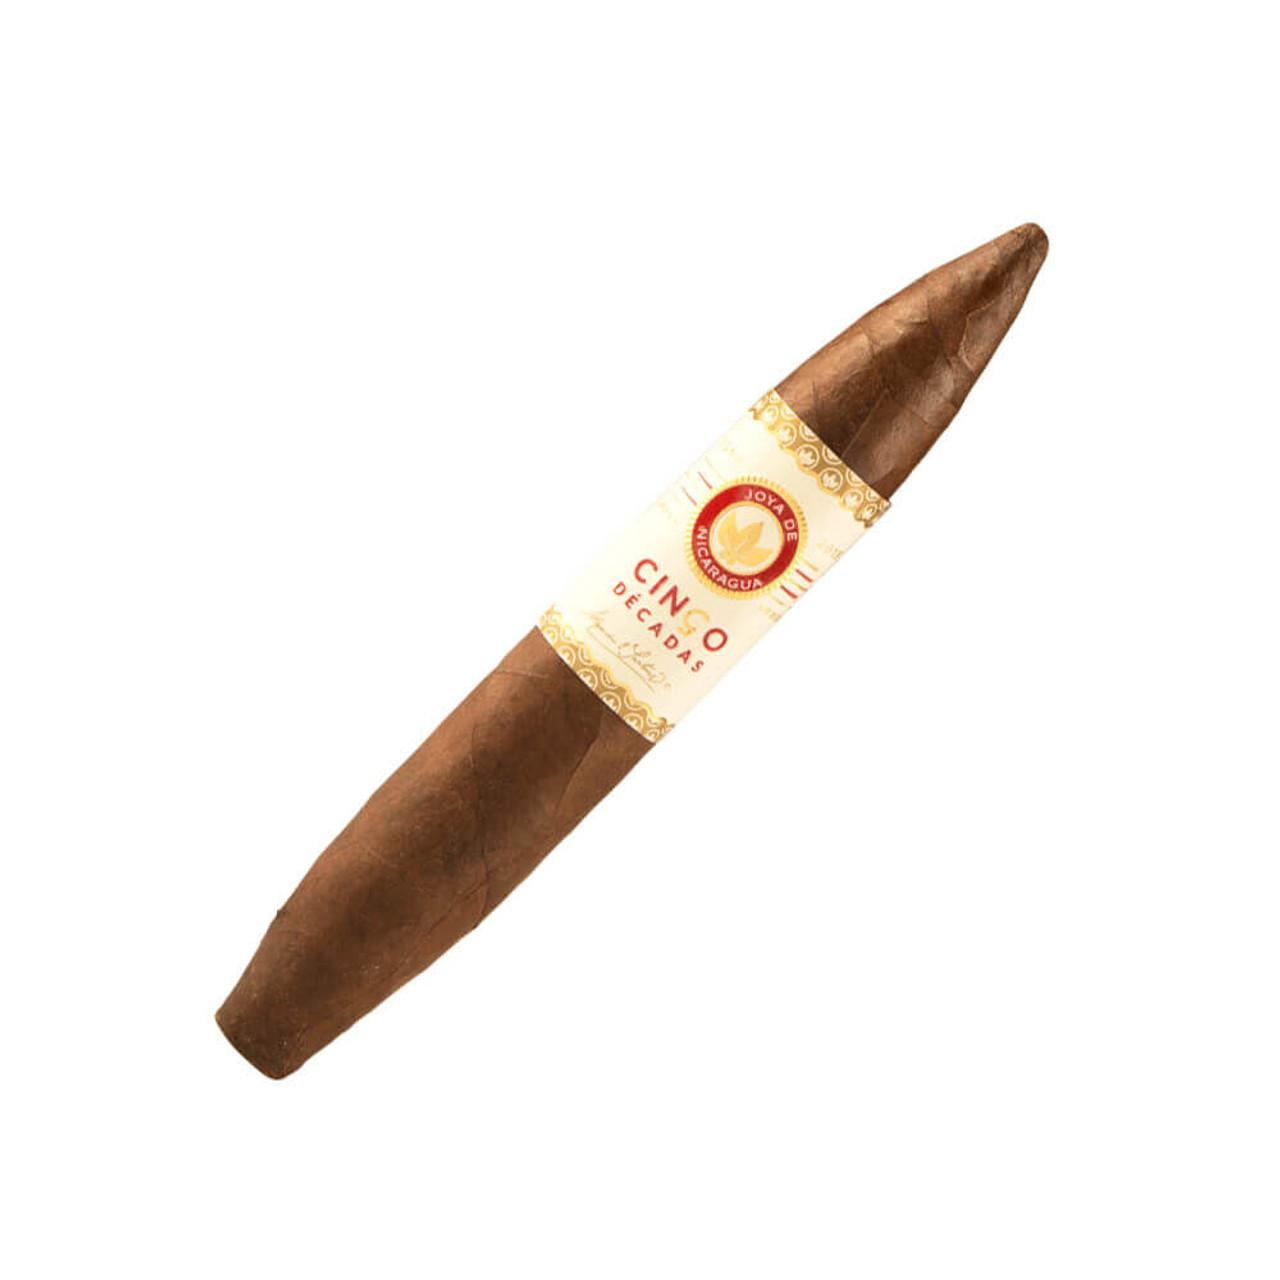 Joya de Nicaragua Cinco Decadas Diadema Cigars - 6 x 54 (Box of 10)